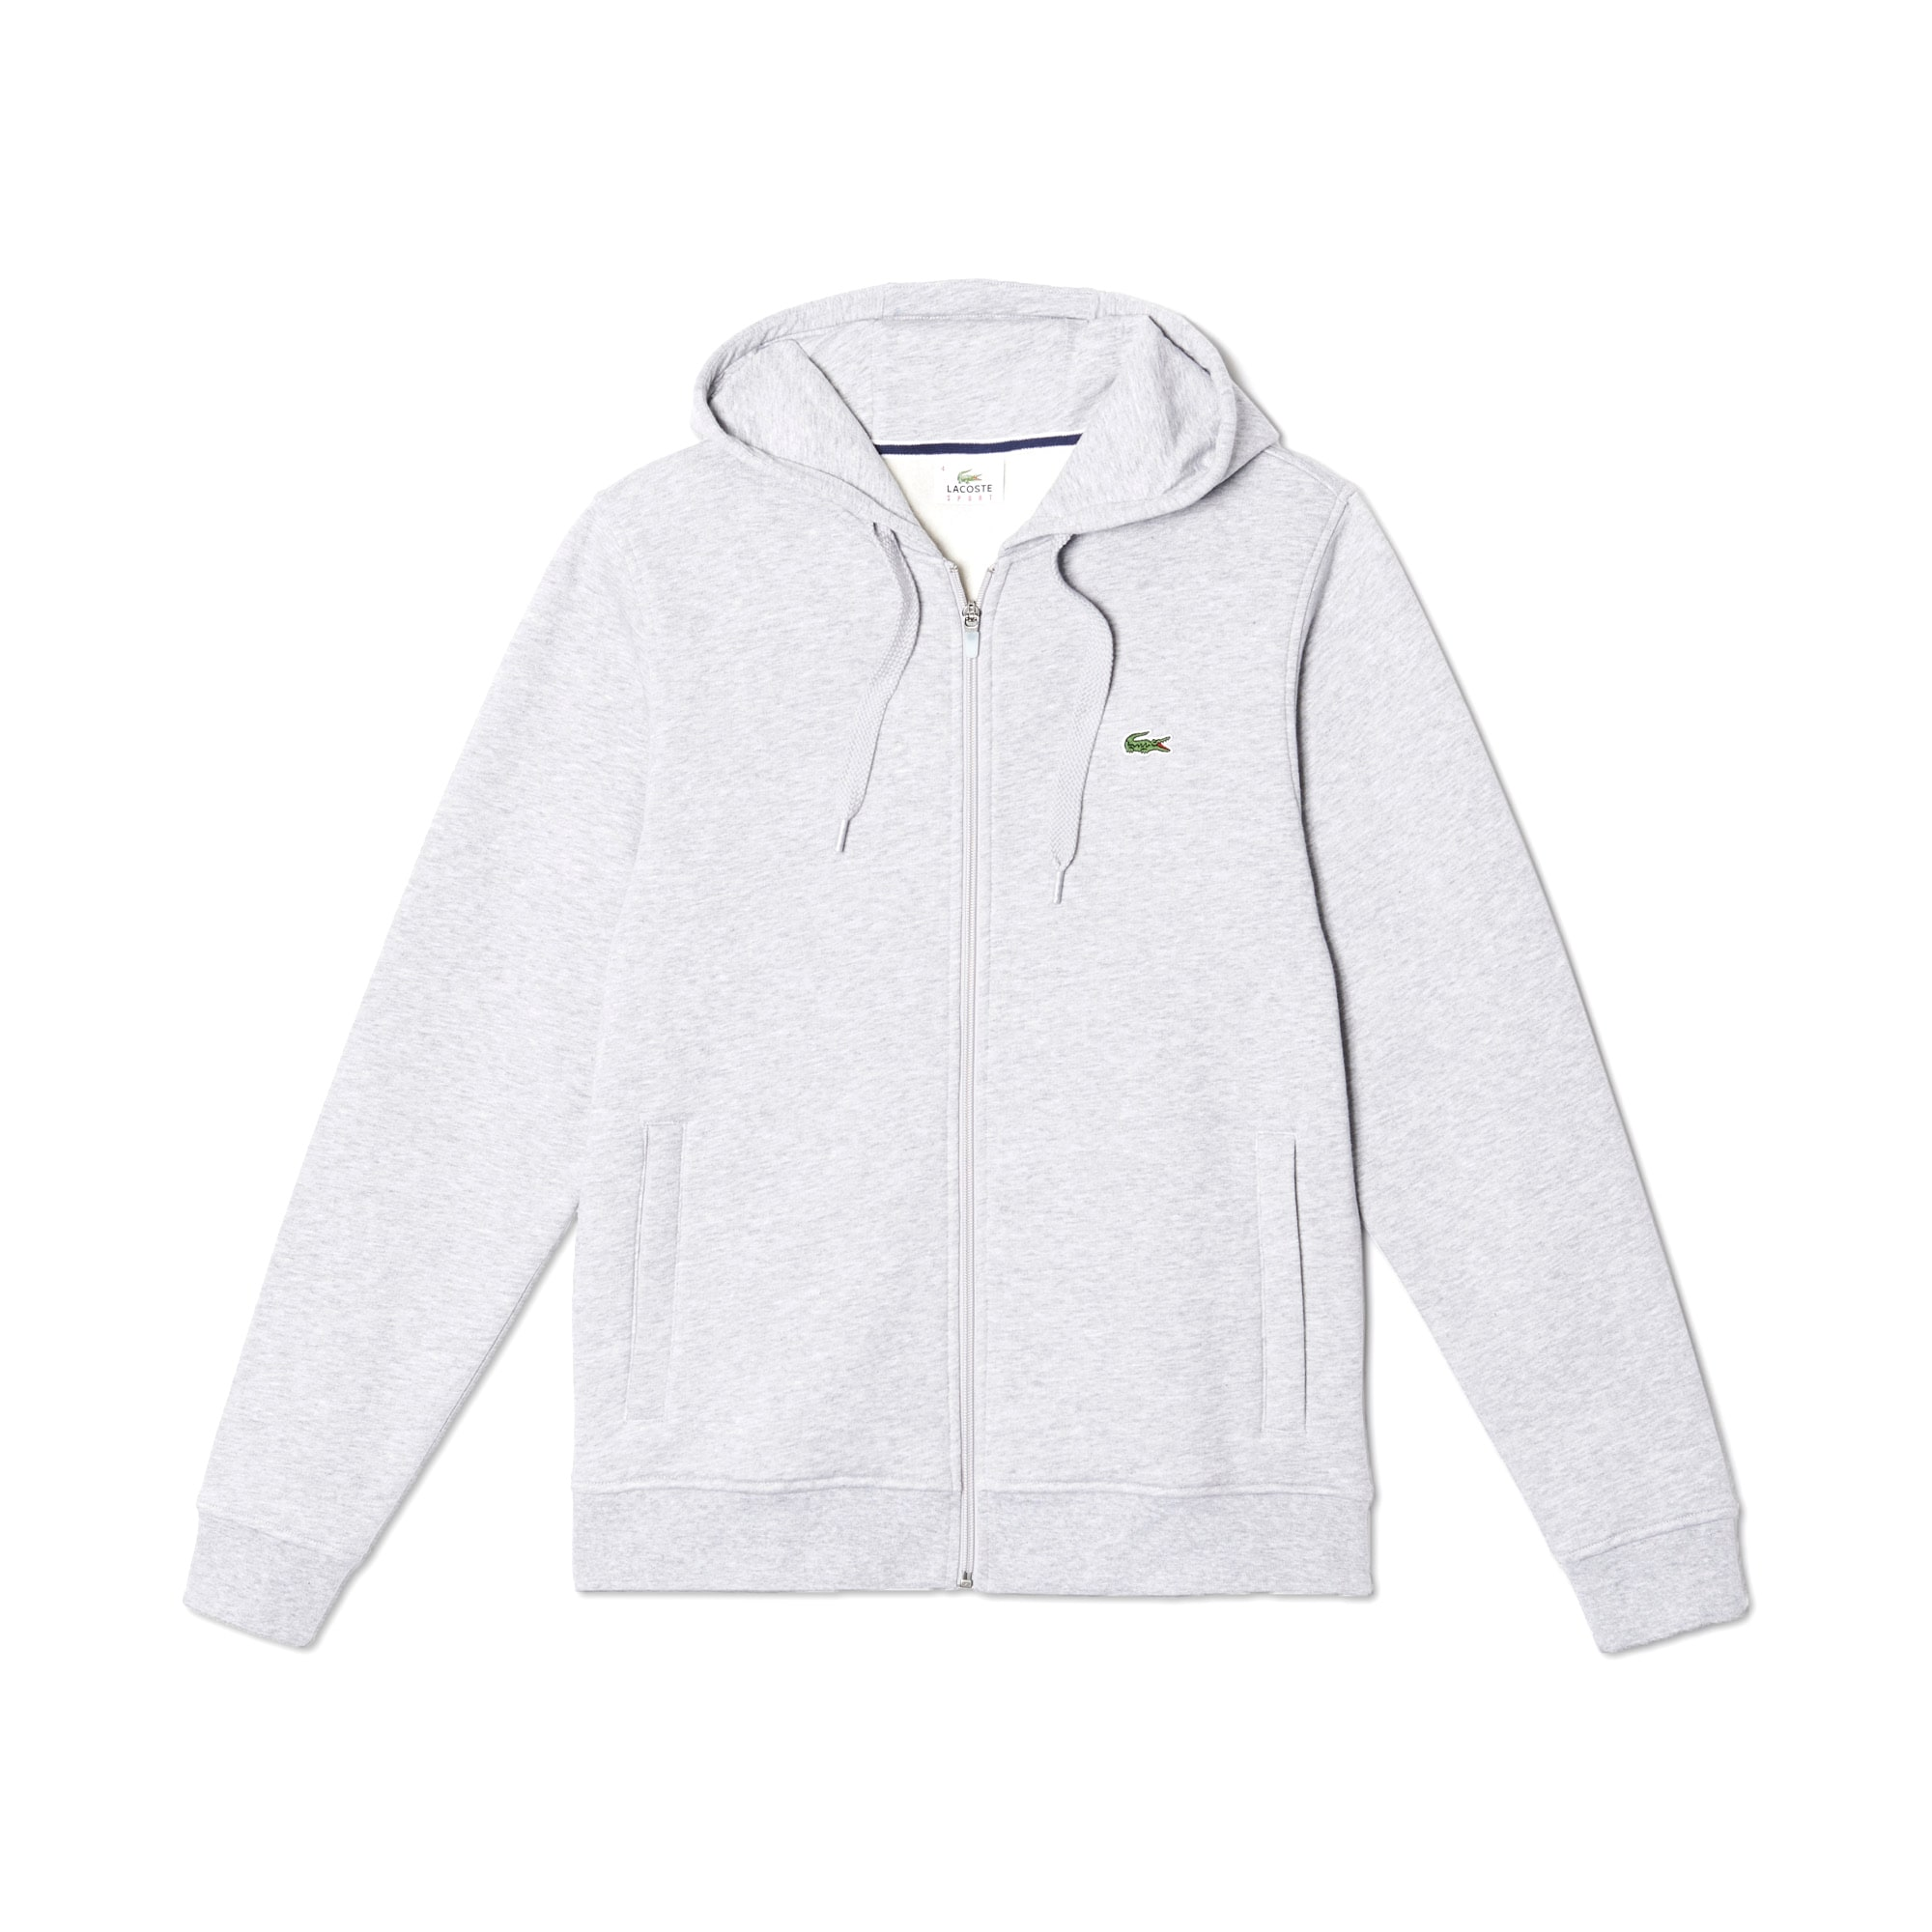 Homme Sweatshirts Sport Sweatshirts Lacoste Vêtements Vêtements Homme Lacoste Sport 8OxqxRIYw